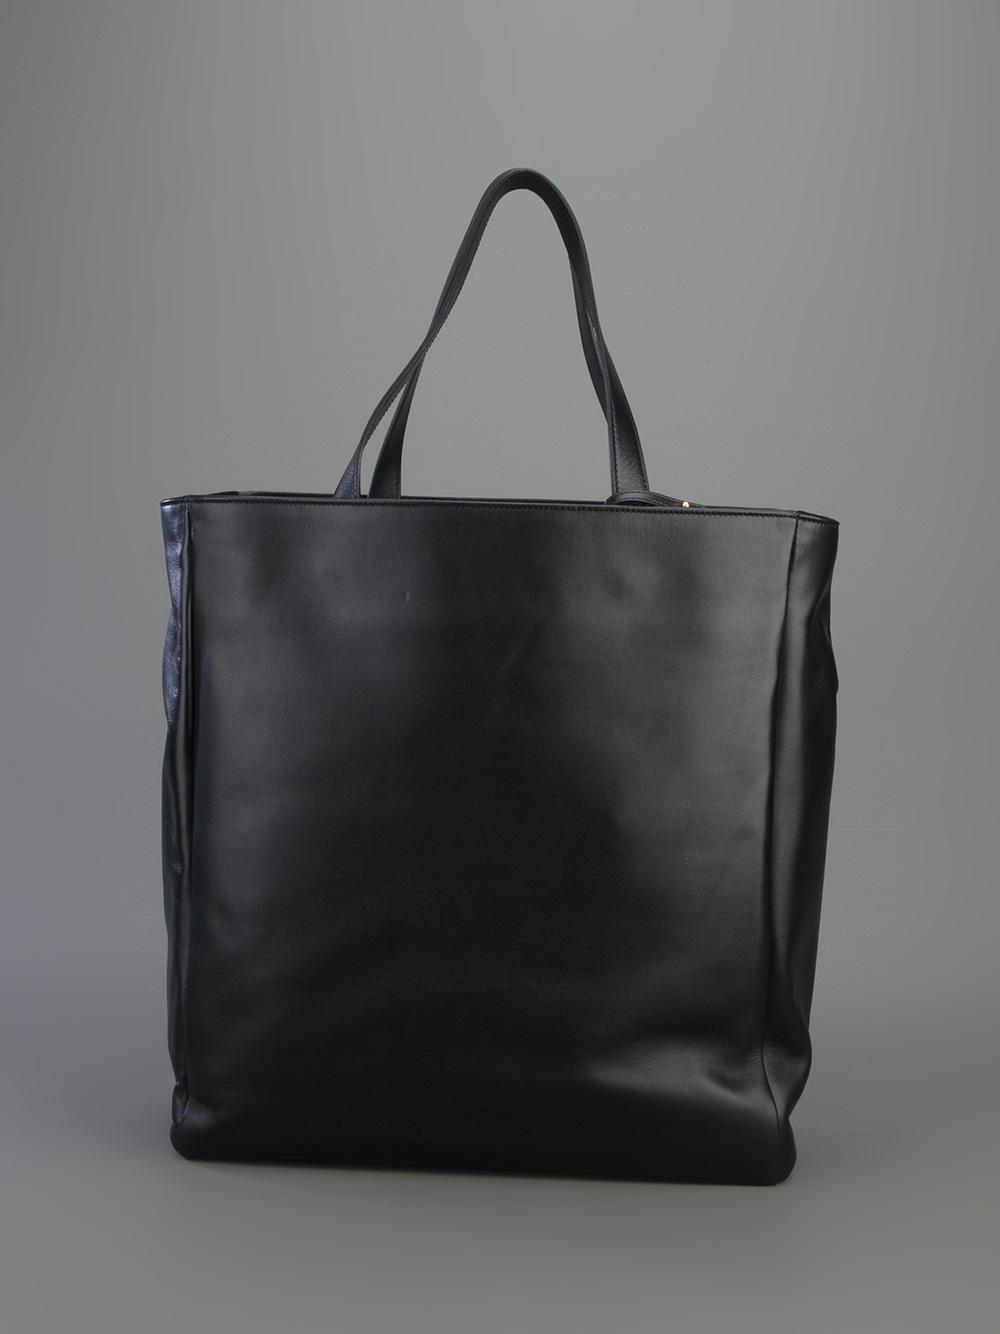 saint laurent classic shopper tote in black lyst. Black Bedroom Furniture Sets. Home Design Ideas